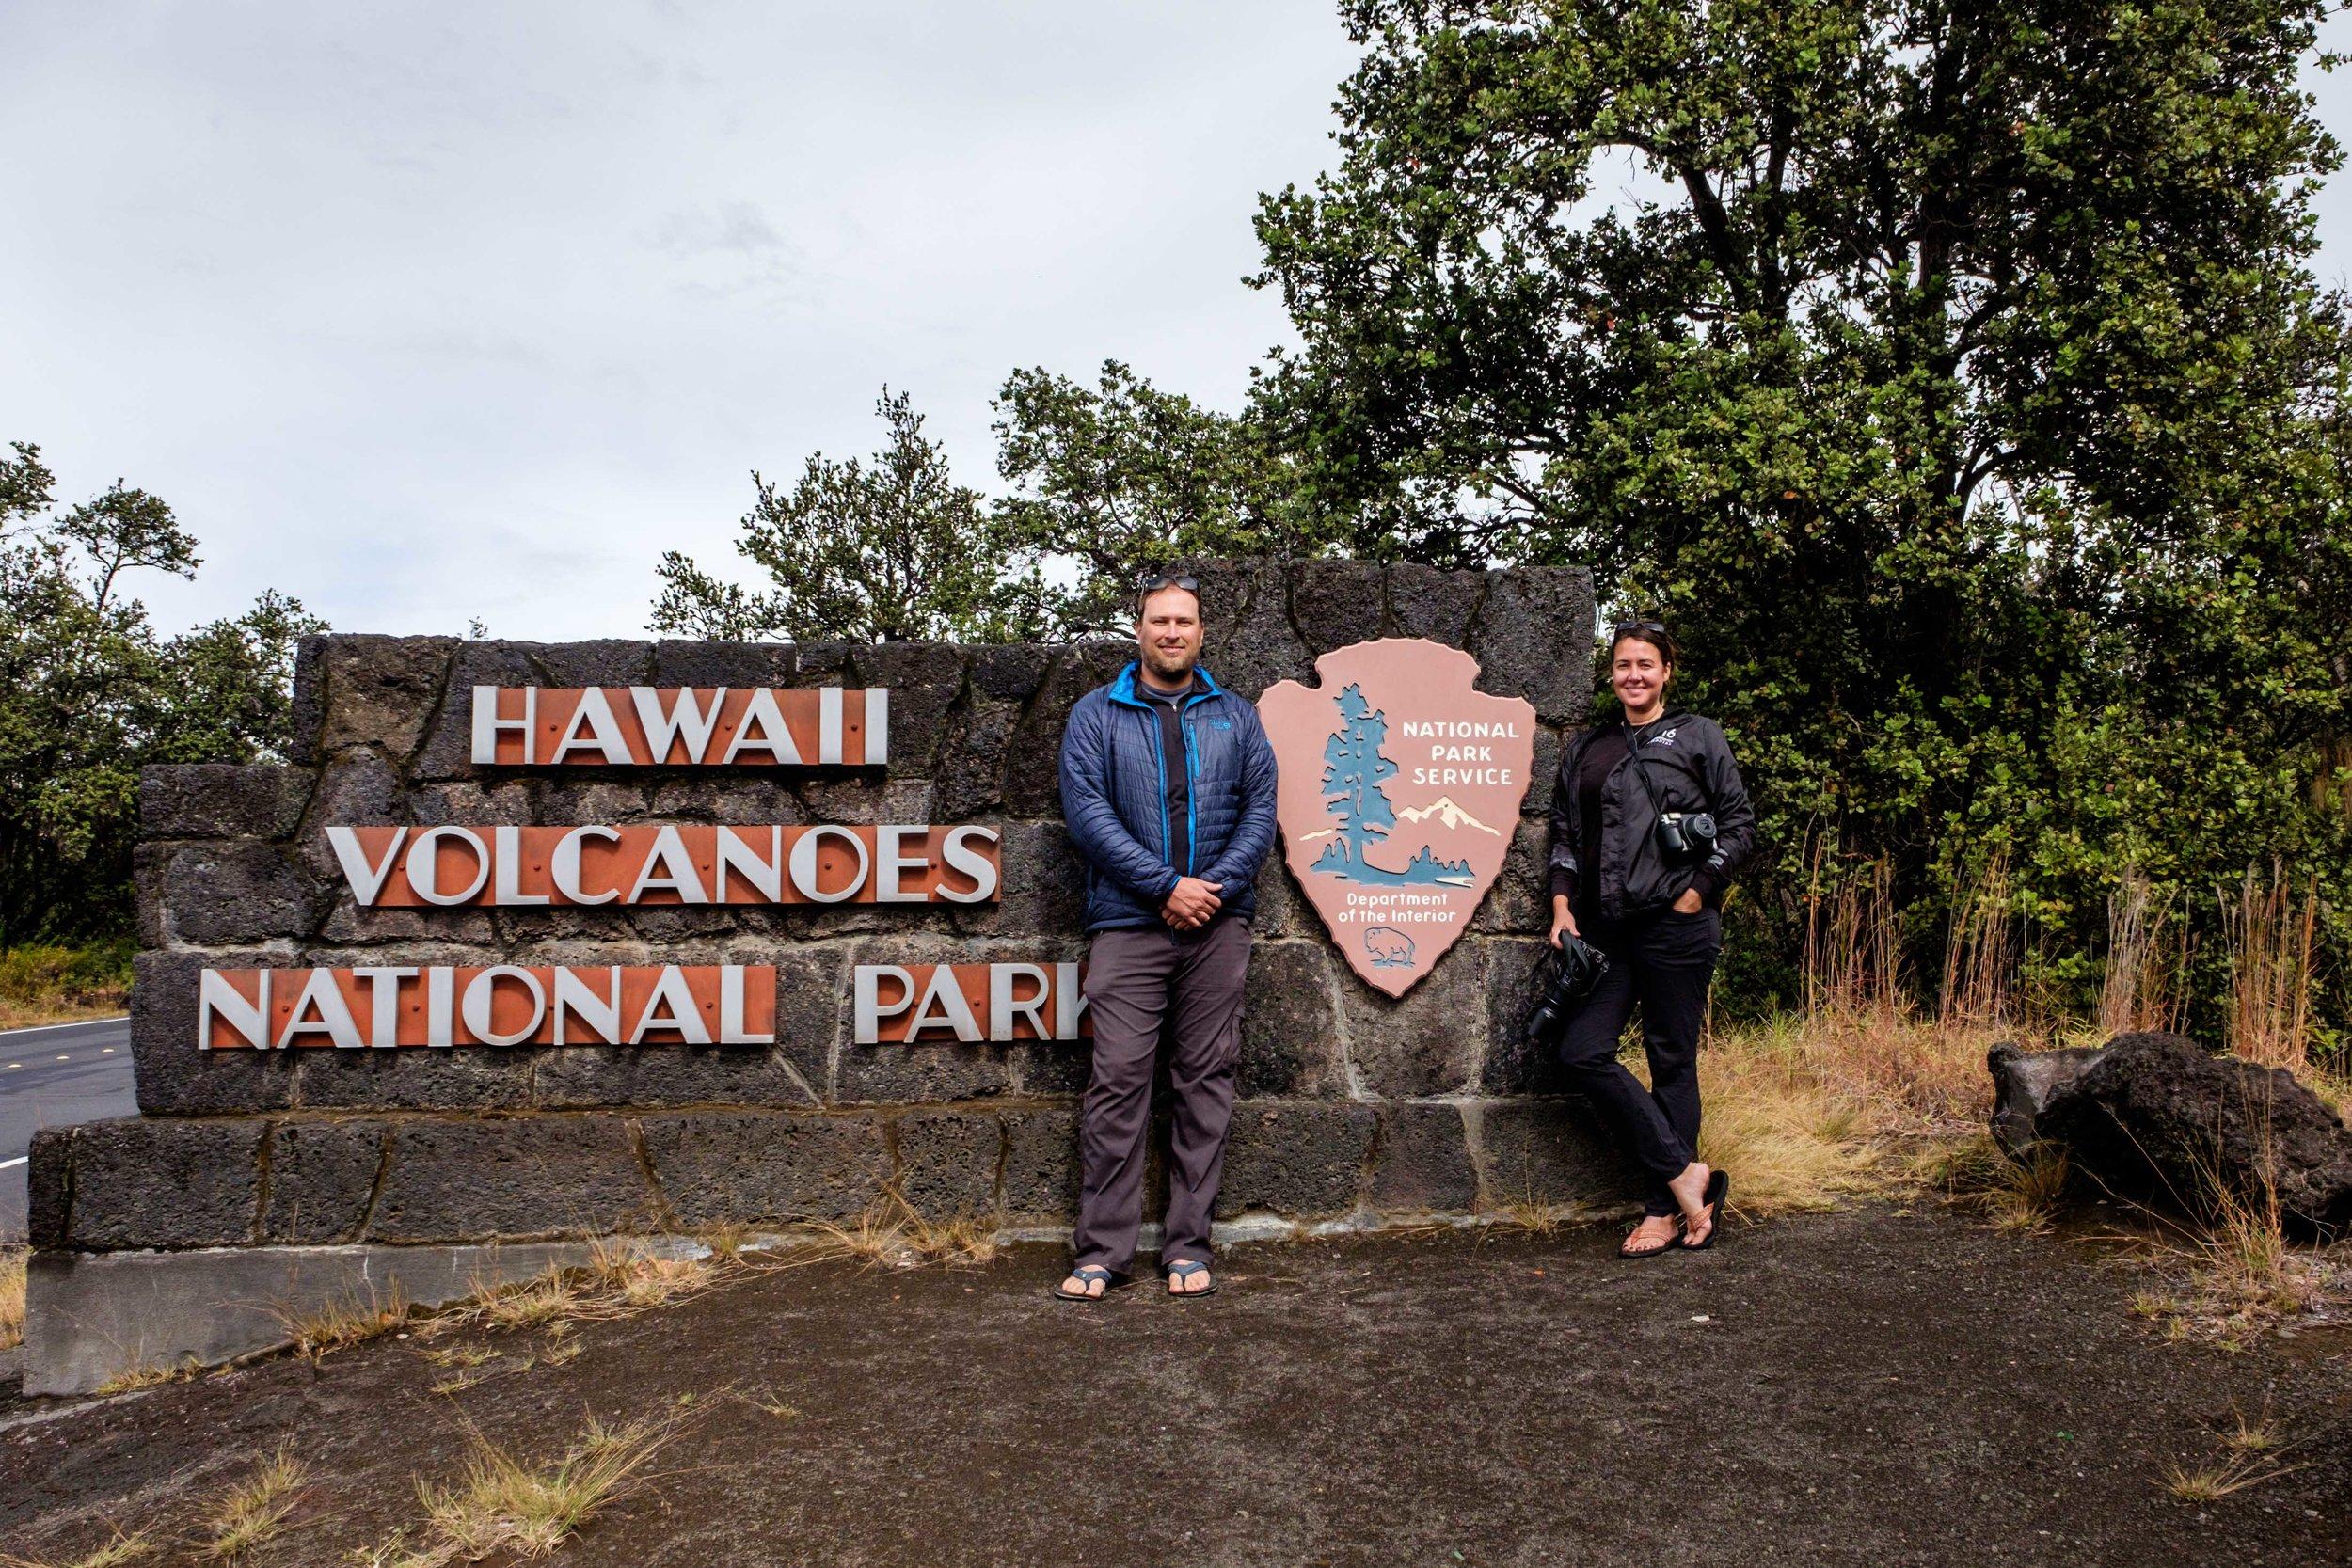 Jonathan Irish and Stefanie Payne at the Hawai'i Volcanoes National Park entrance sign.